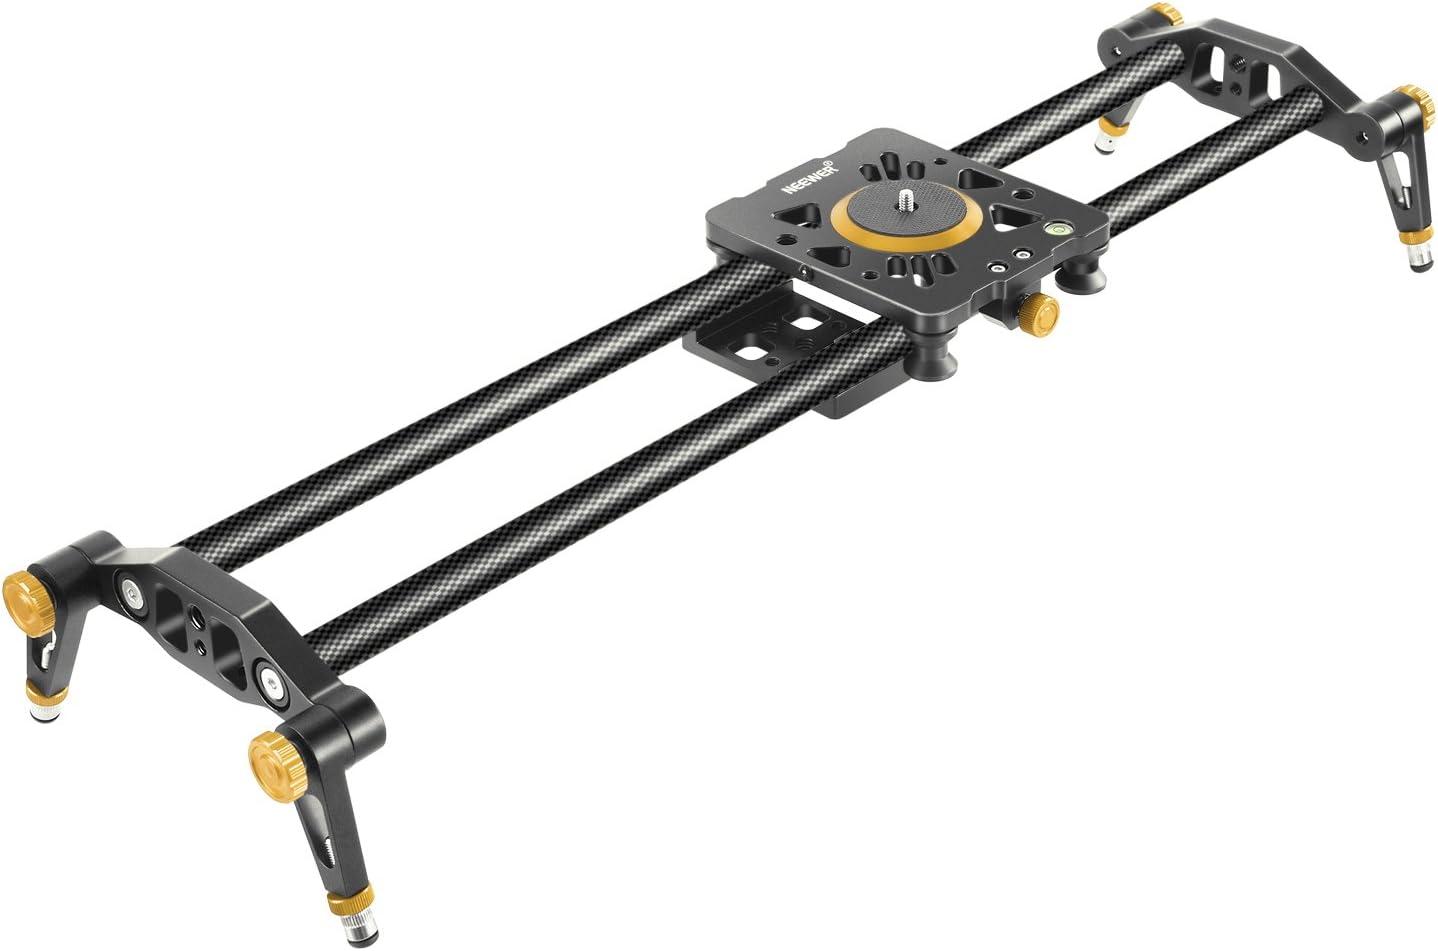 Neewer 60cm Kohlefaser Kamera Streckenschieber Video Kamera